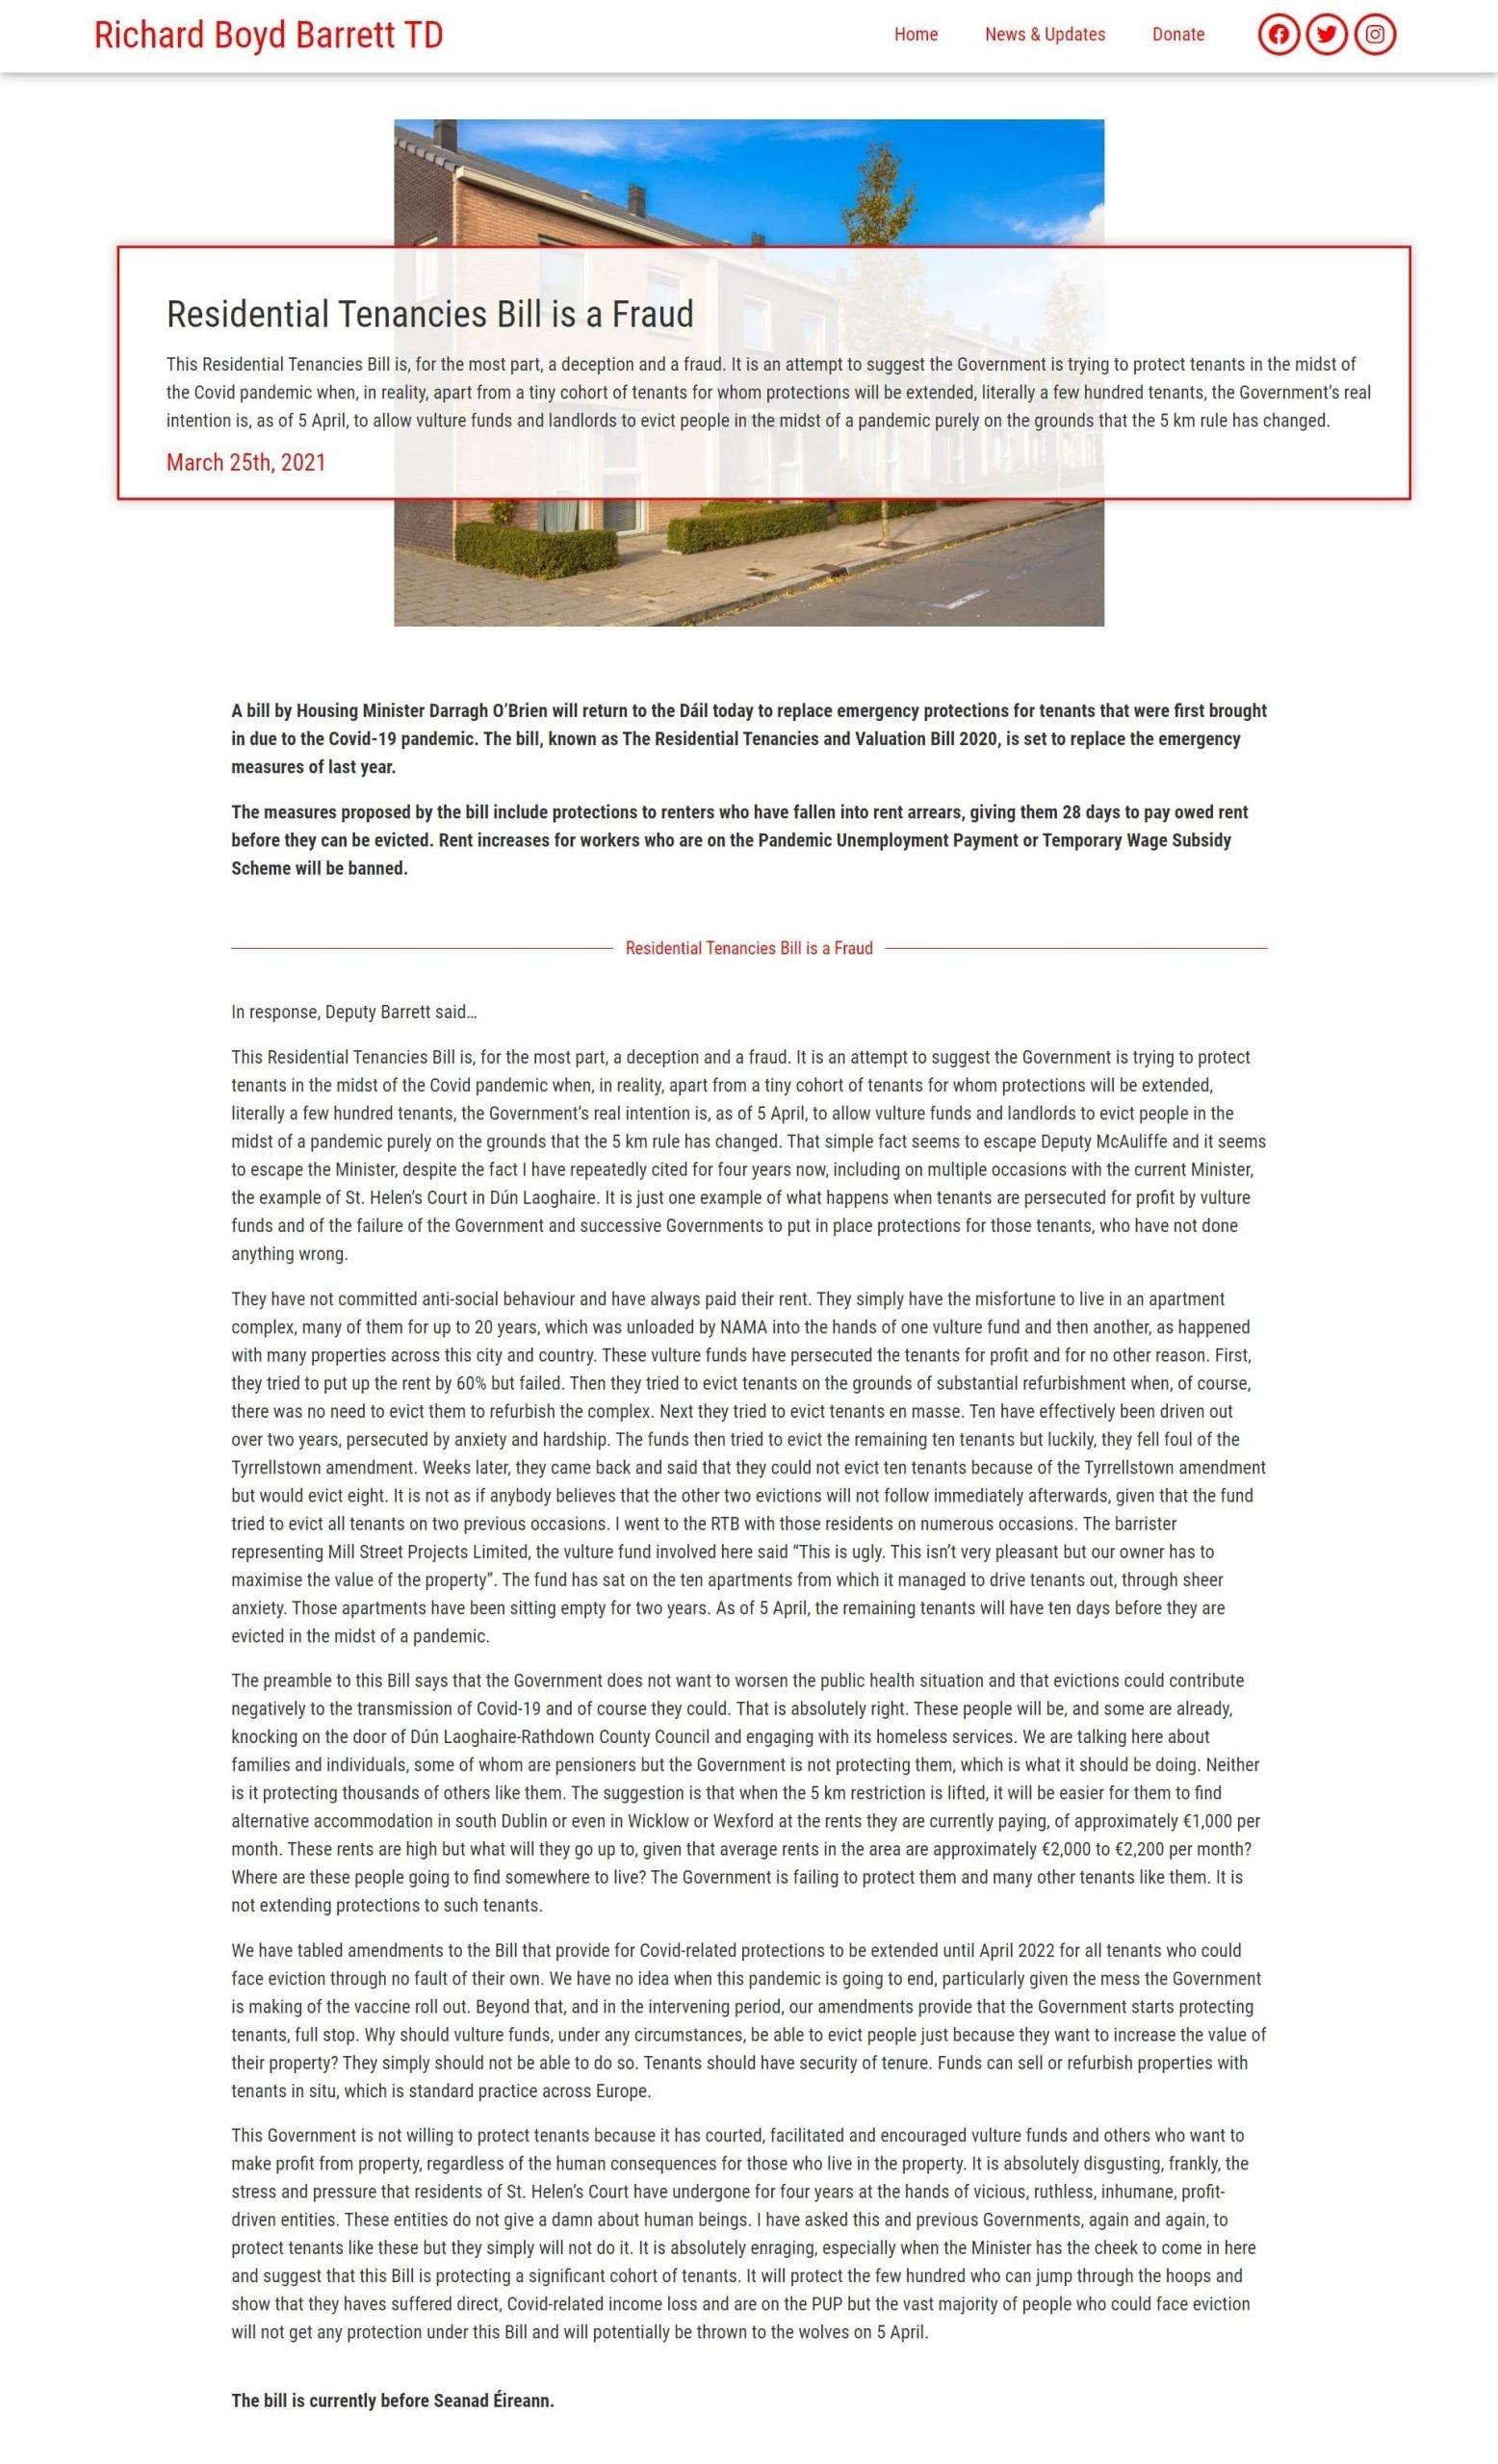 Political Website Content Demo Post